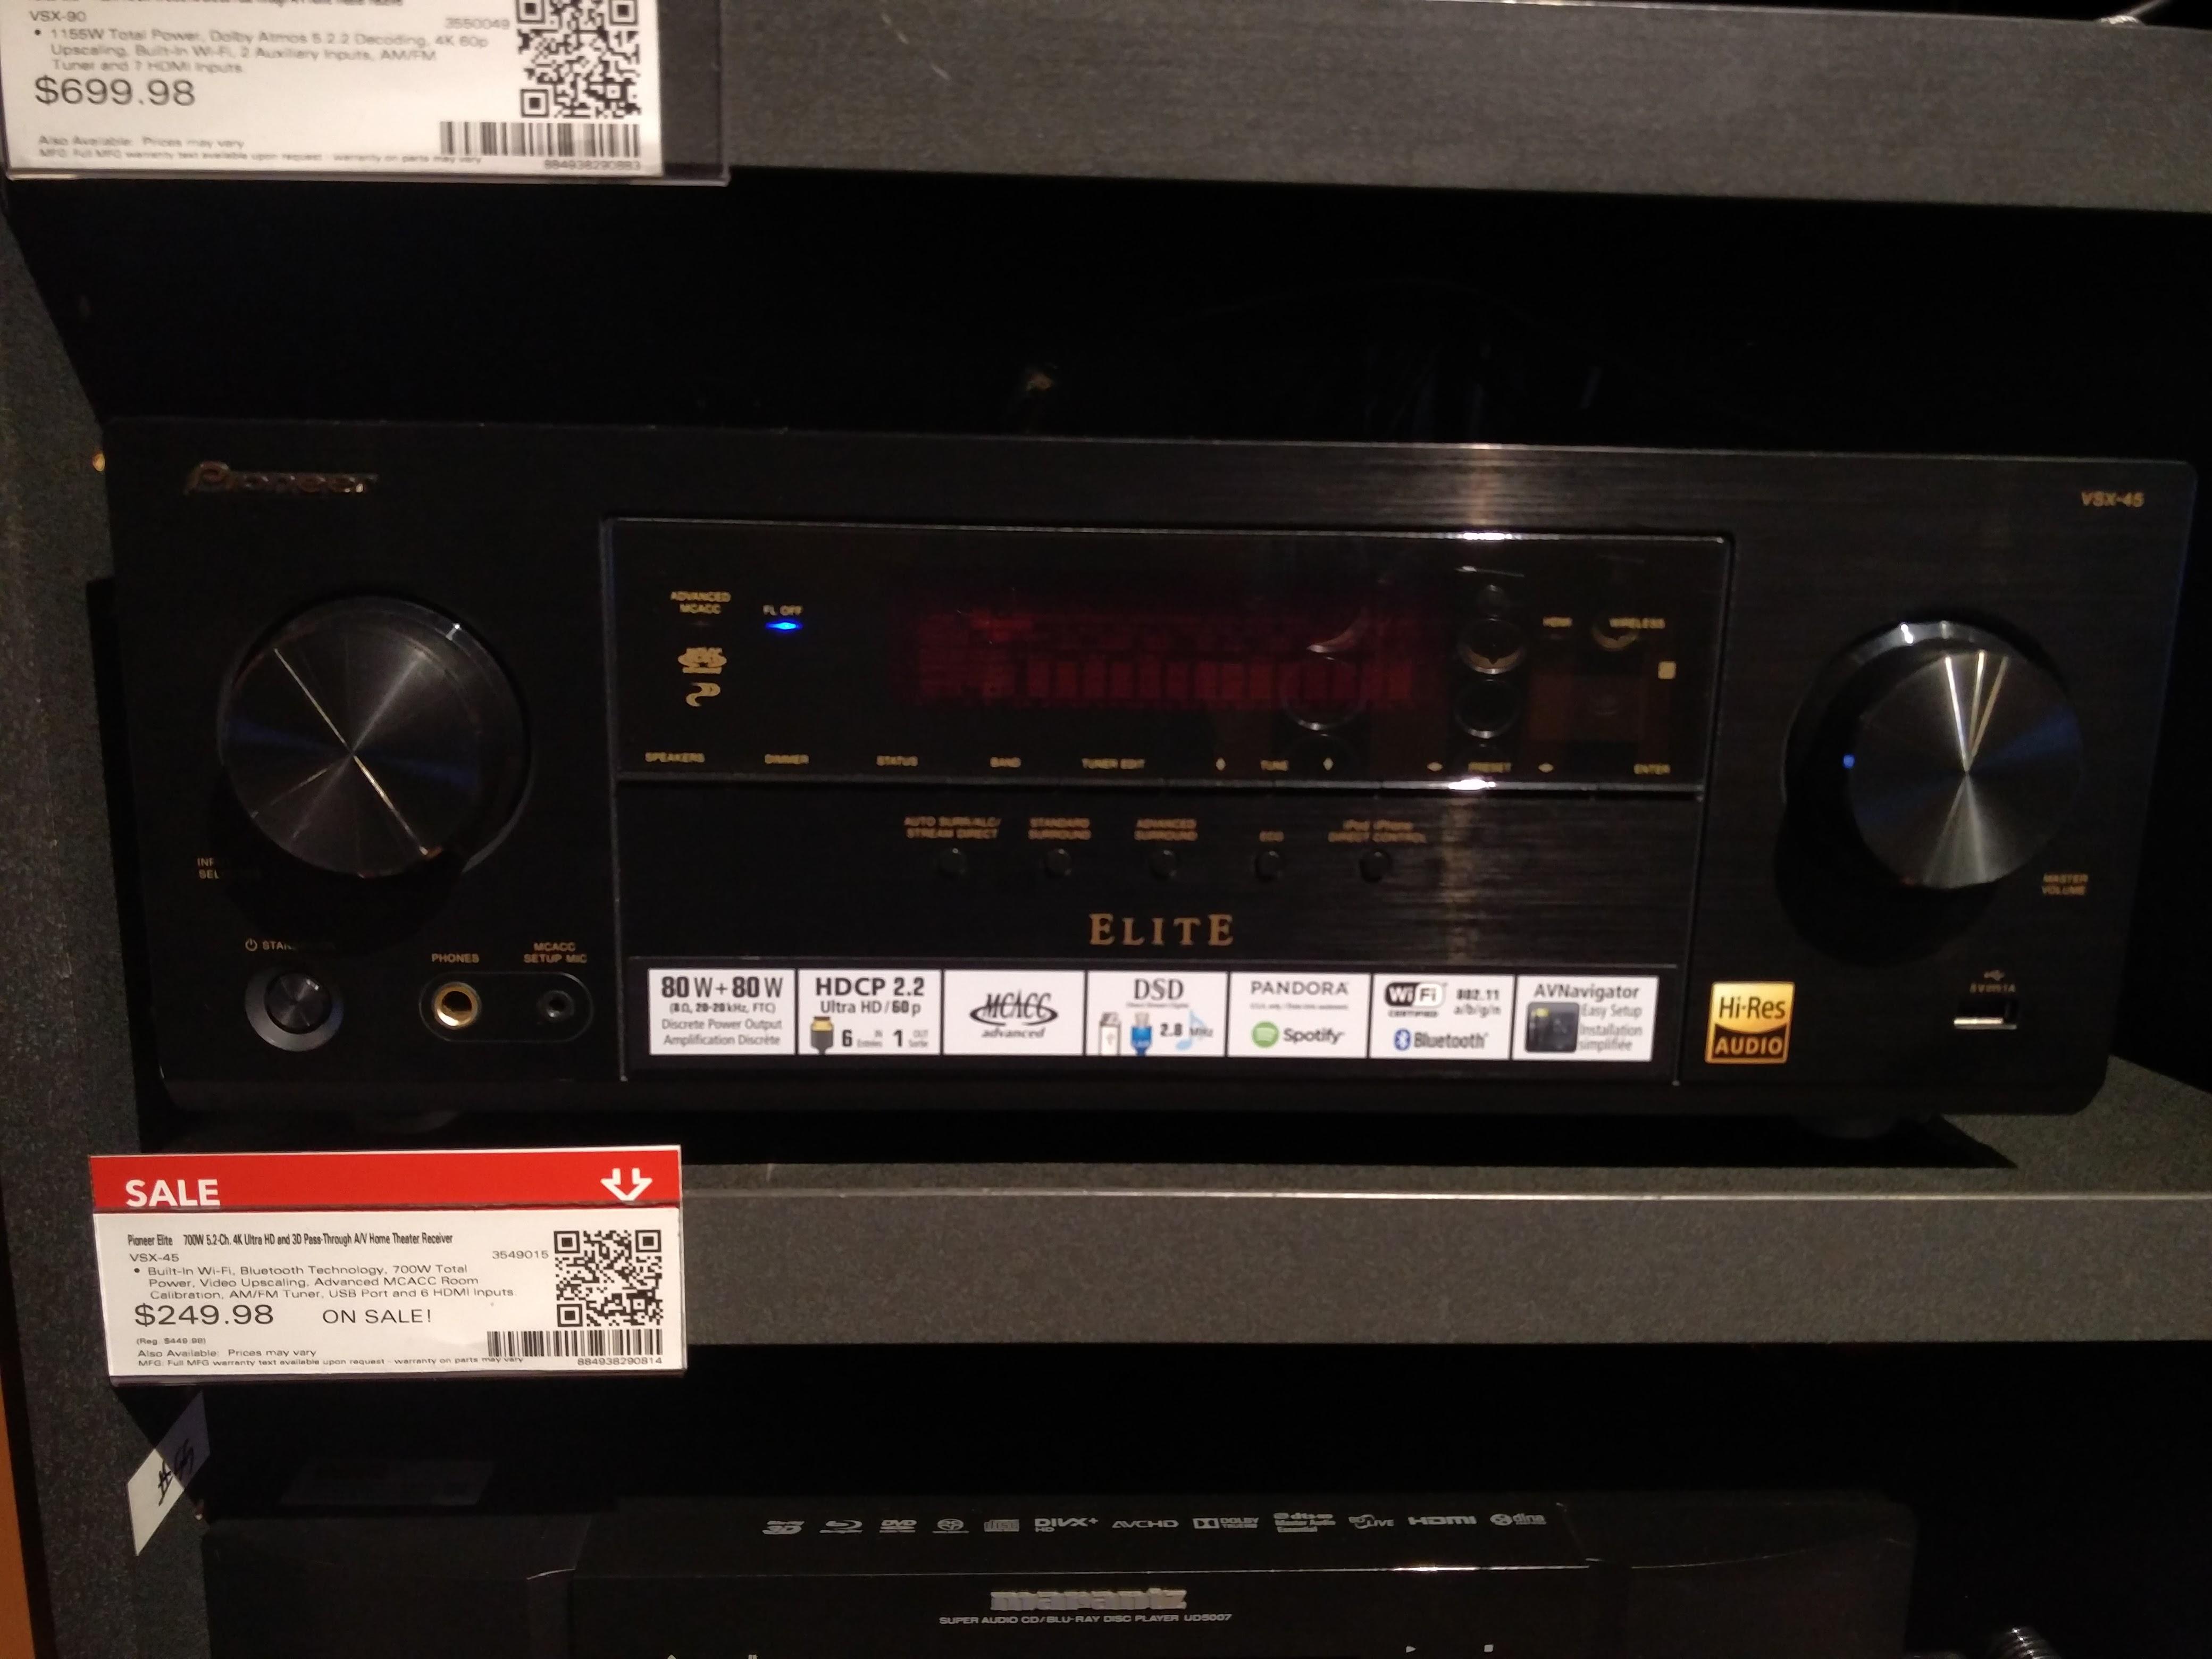 Pioneer Elite VSX-45 - $249.98 @ Best Buy Instore YMMV - bb.com will PM instore price